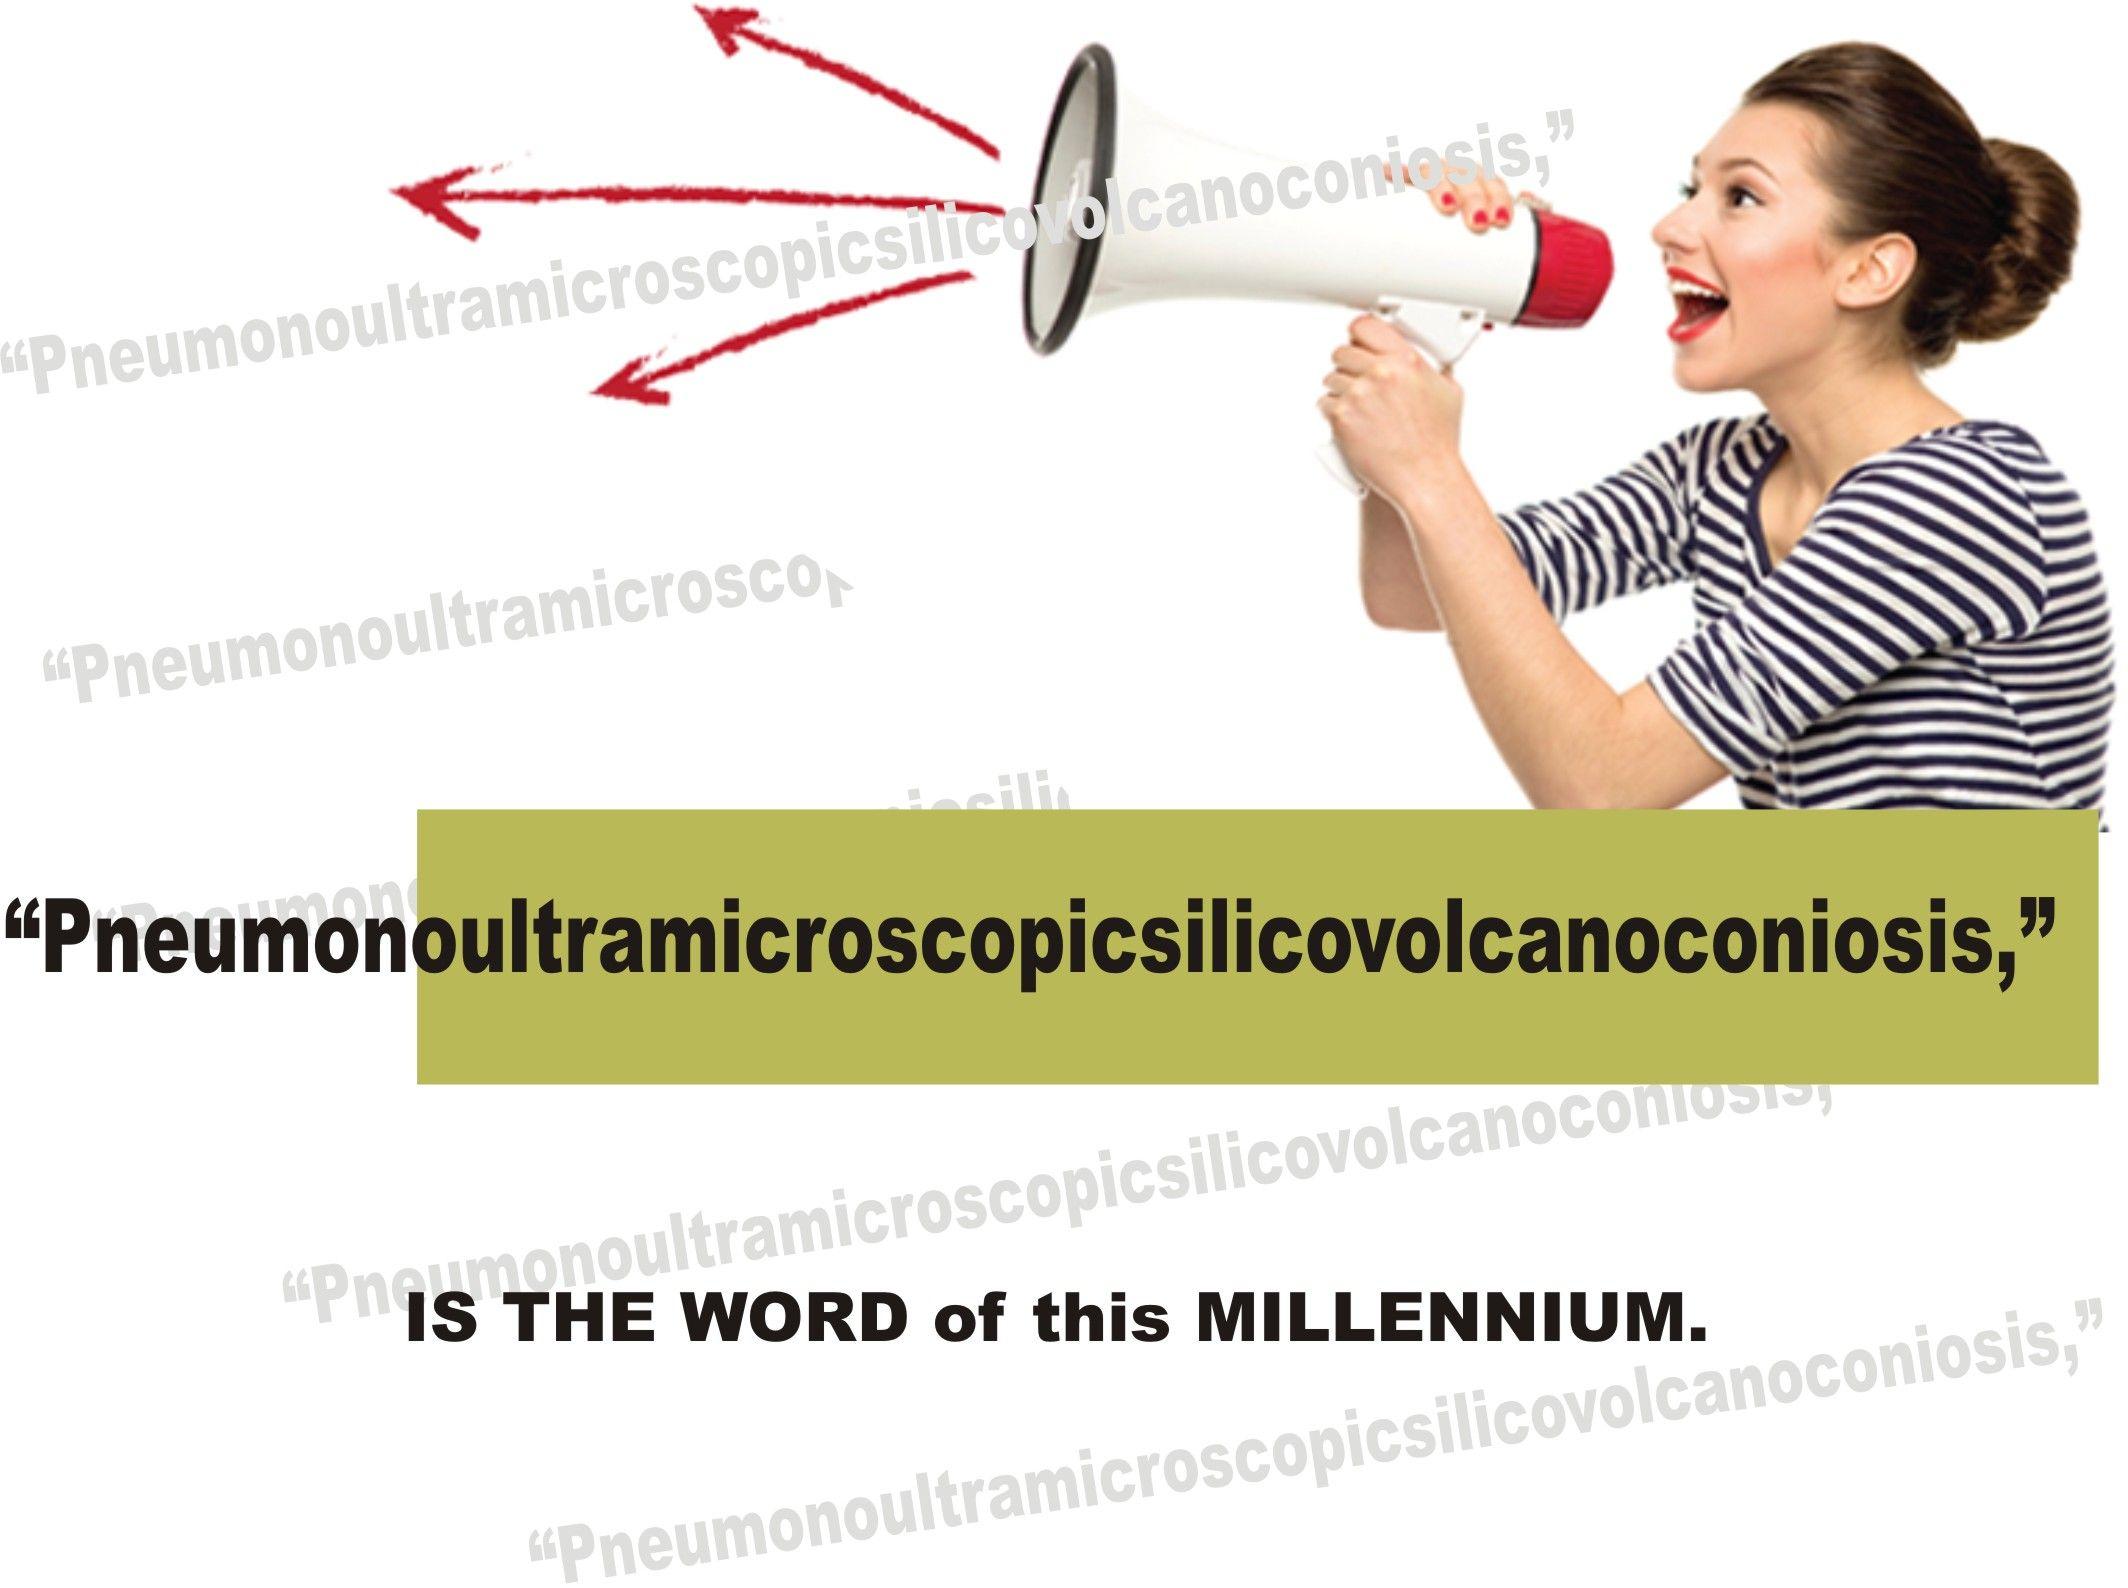 """Pneumonoultramicroscopicsilicovolcanoconiosis,""  IS THE WORD of this MILLENNIUM.  READ MORE : www.englishandliterature.com"